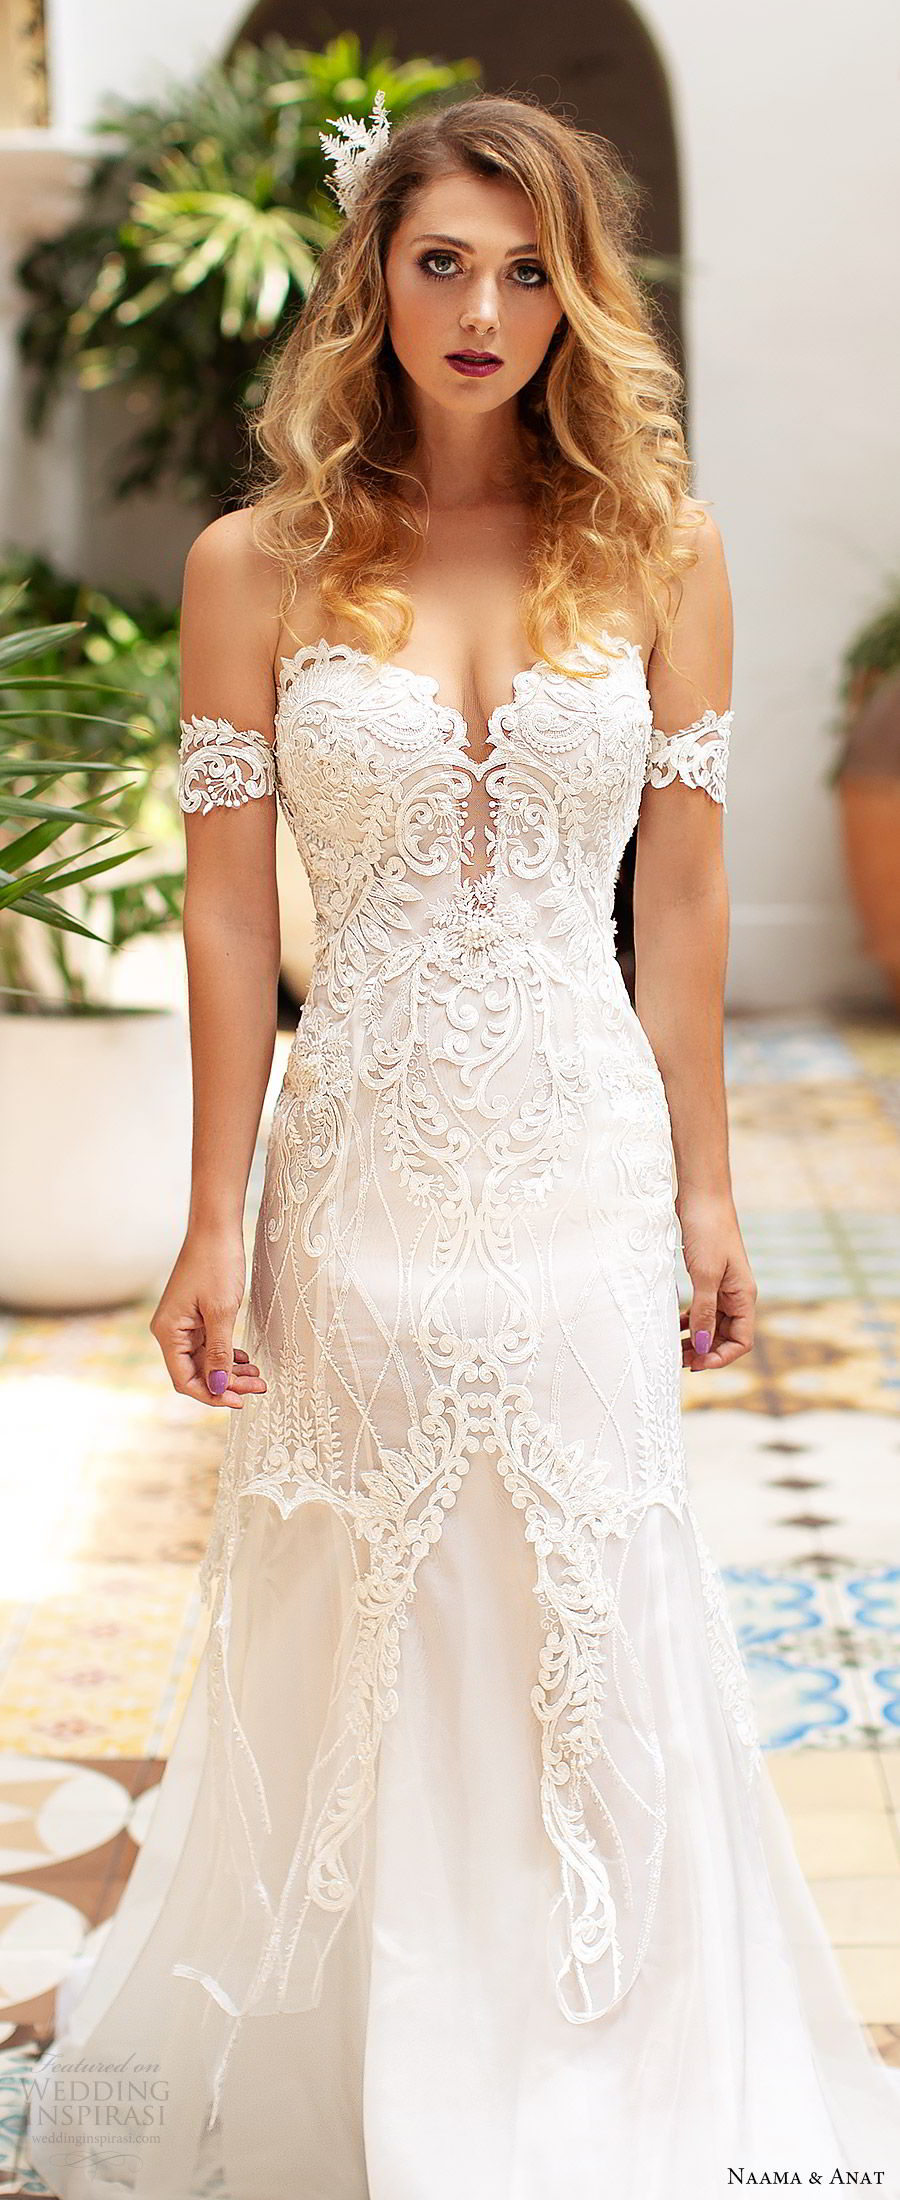 naama anat 2019 bridal off shoulder plunging sweetheart neckline embellished bodice fit flare lace wedding dress sweep train modern romantic (2) zv